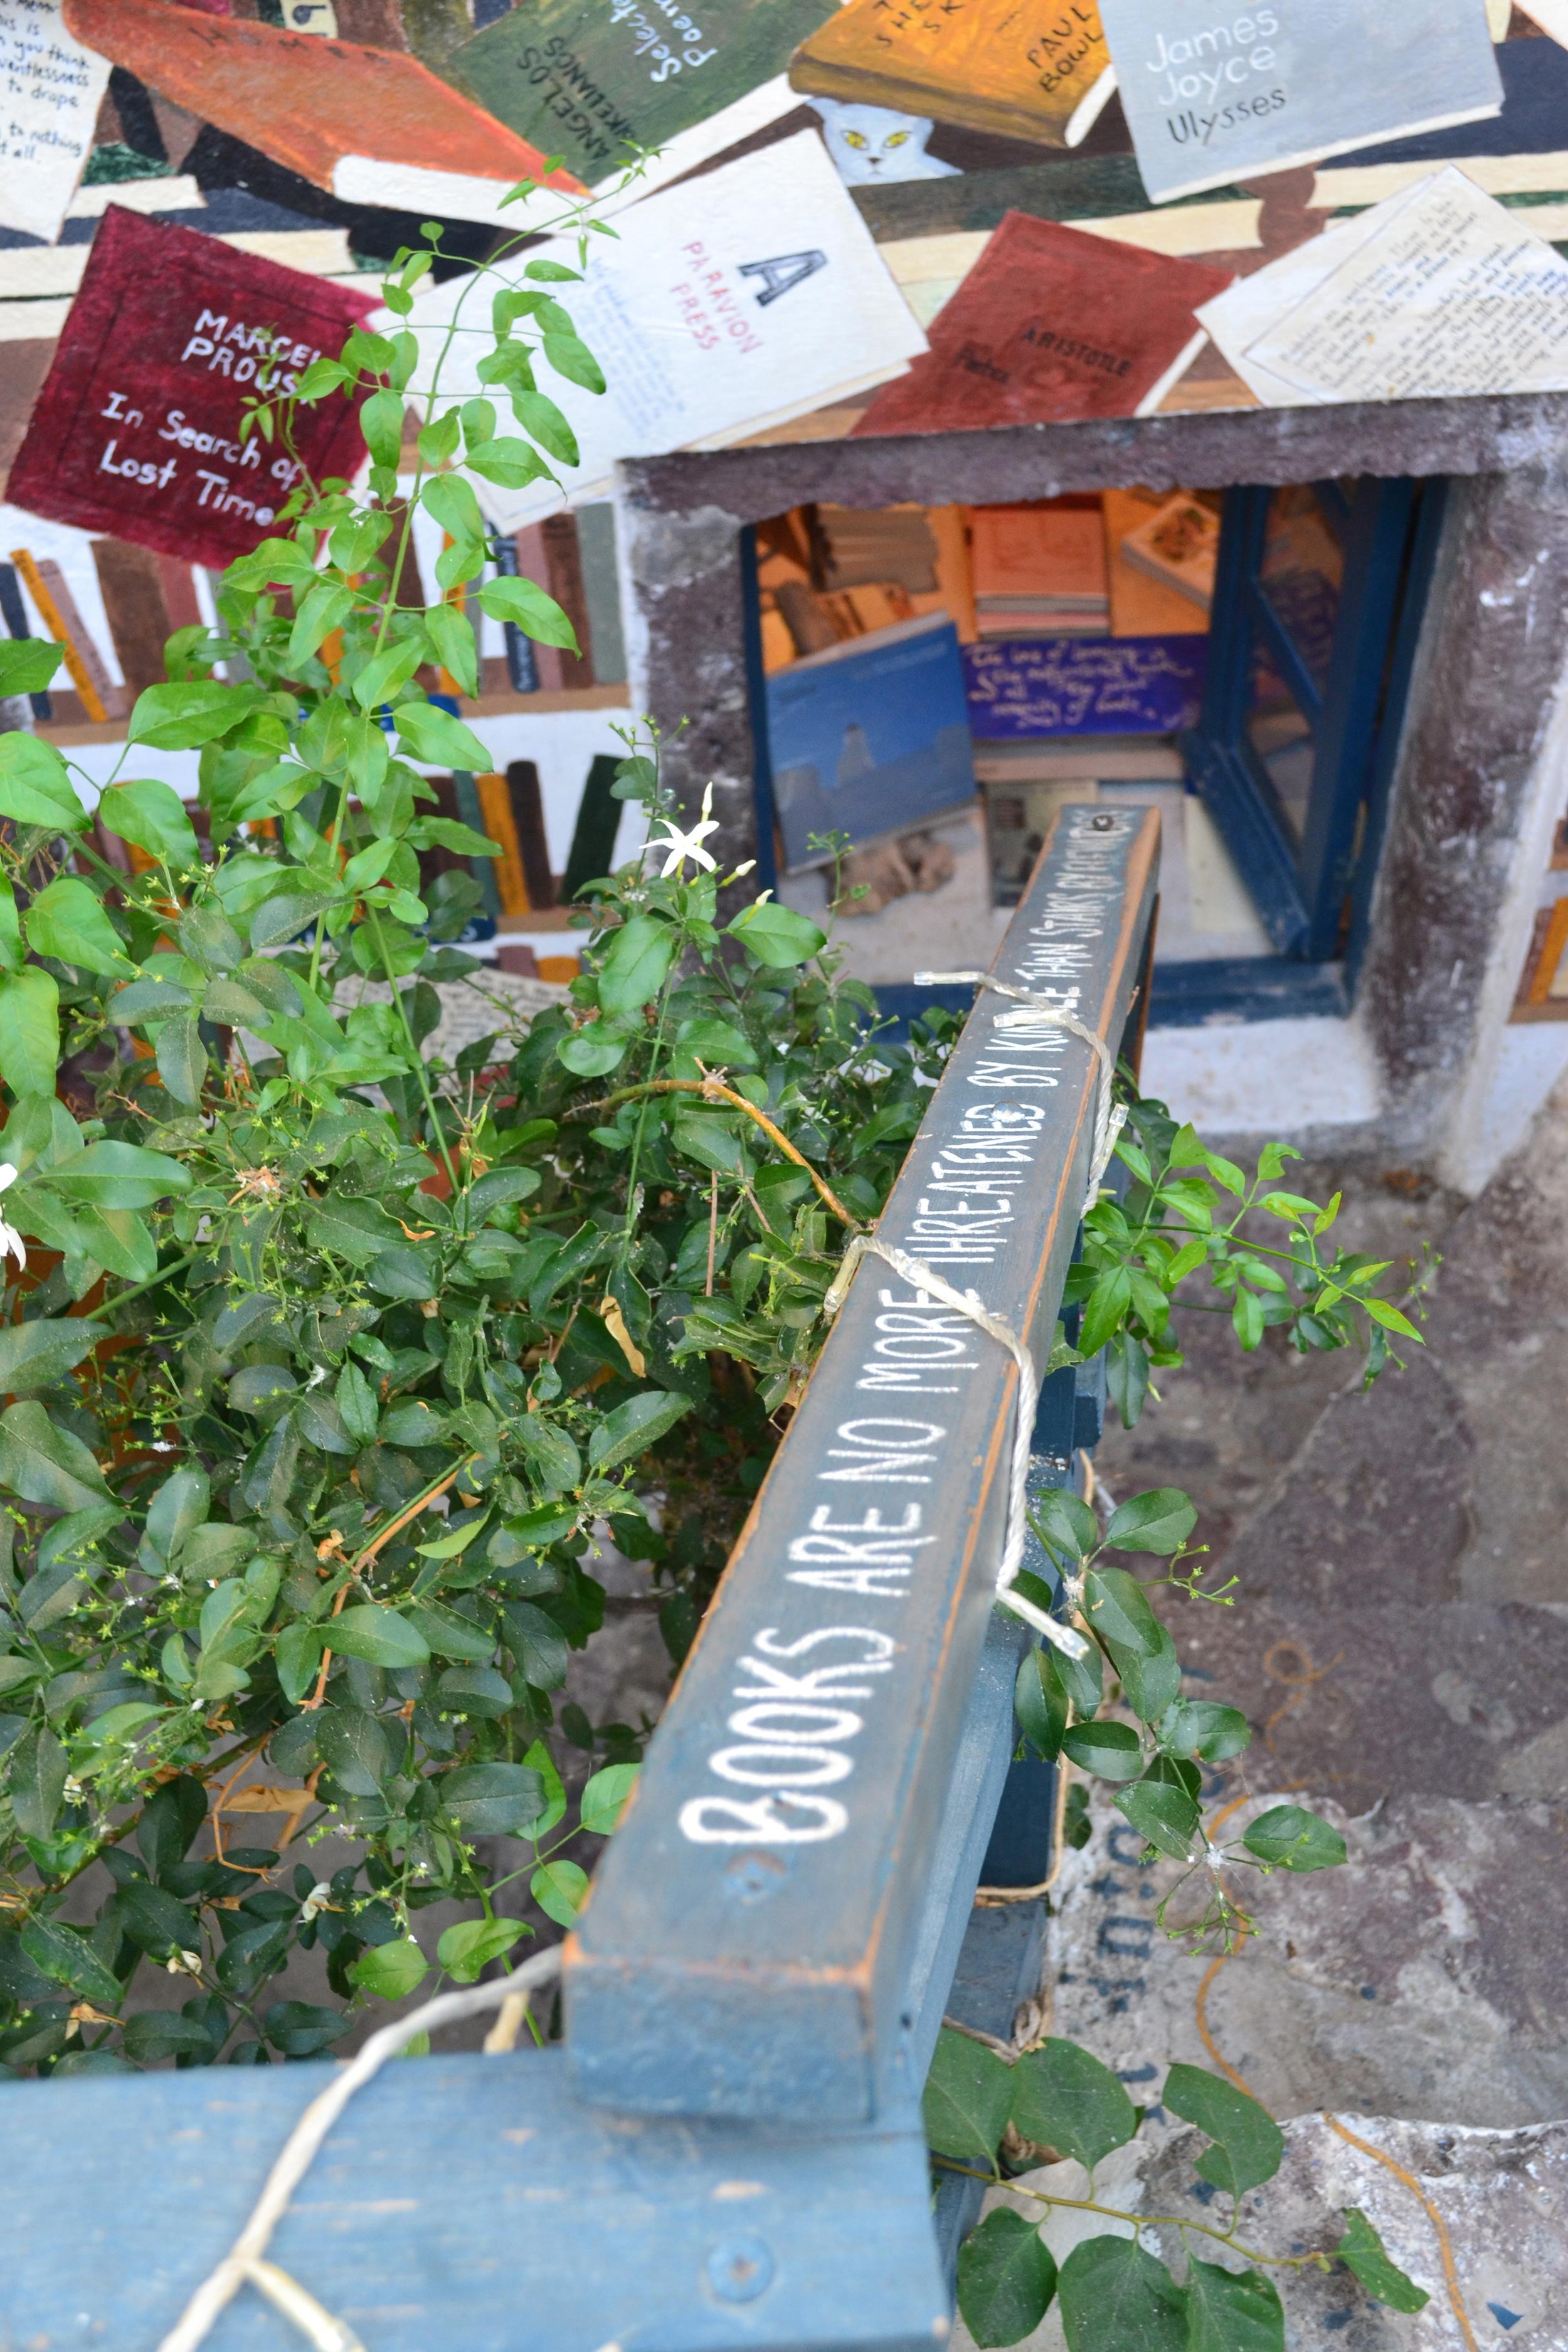 The way down to Atlantis Bookshop...